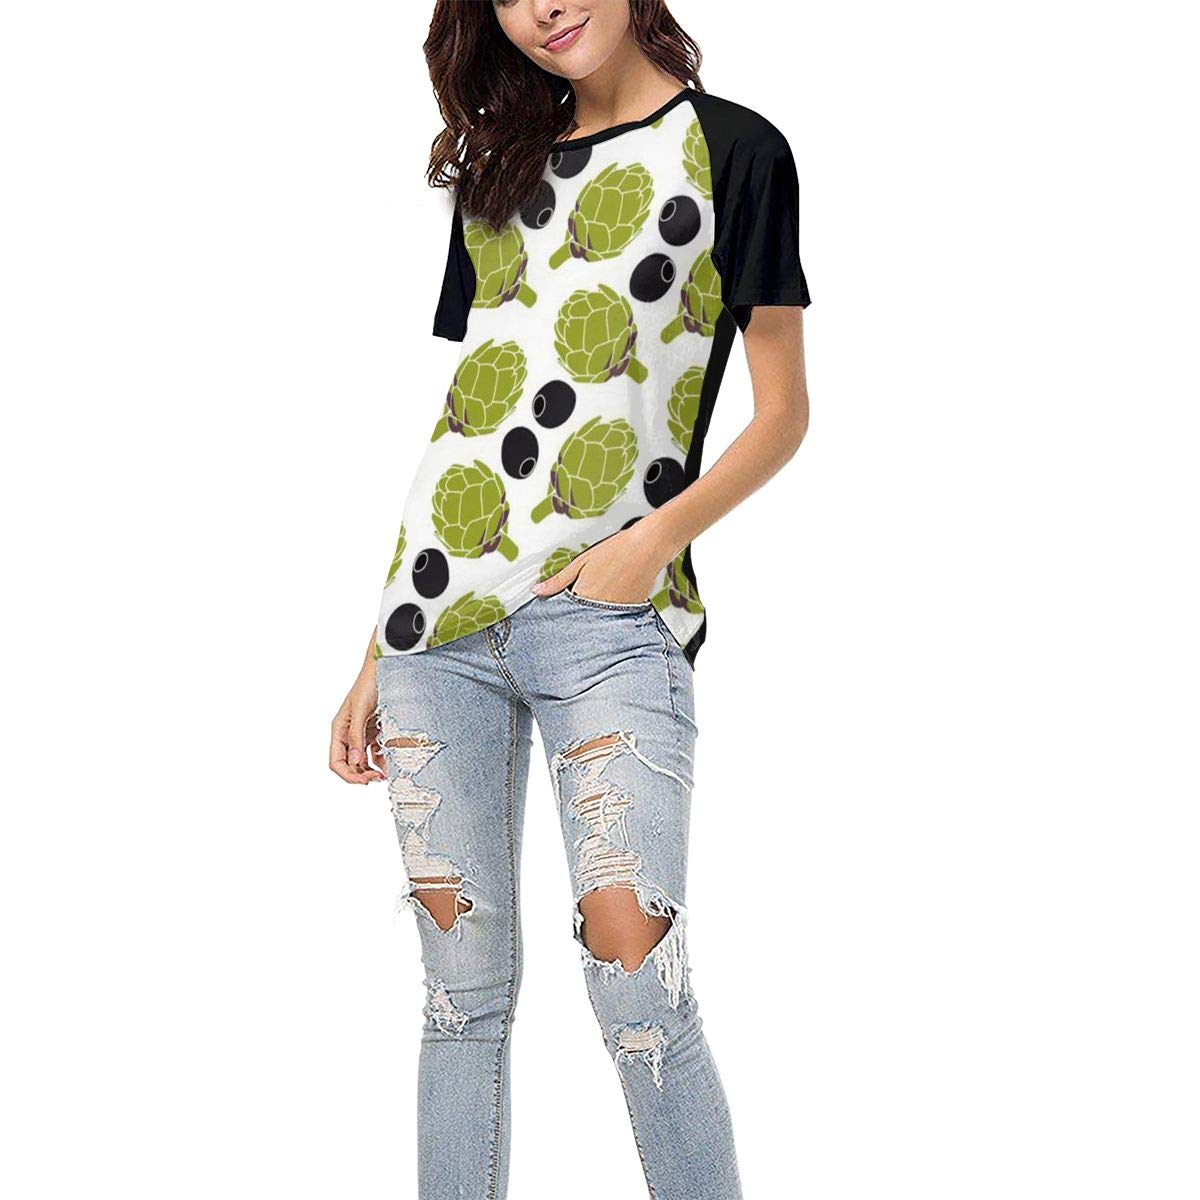 QWXZC Olive Salad Womens Short Sleeves Baseball Tee Casual Raglan Shirt Baseball Raglan T-Shirt.Black.